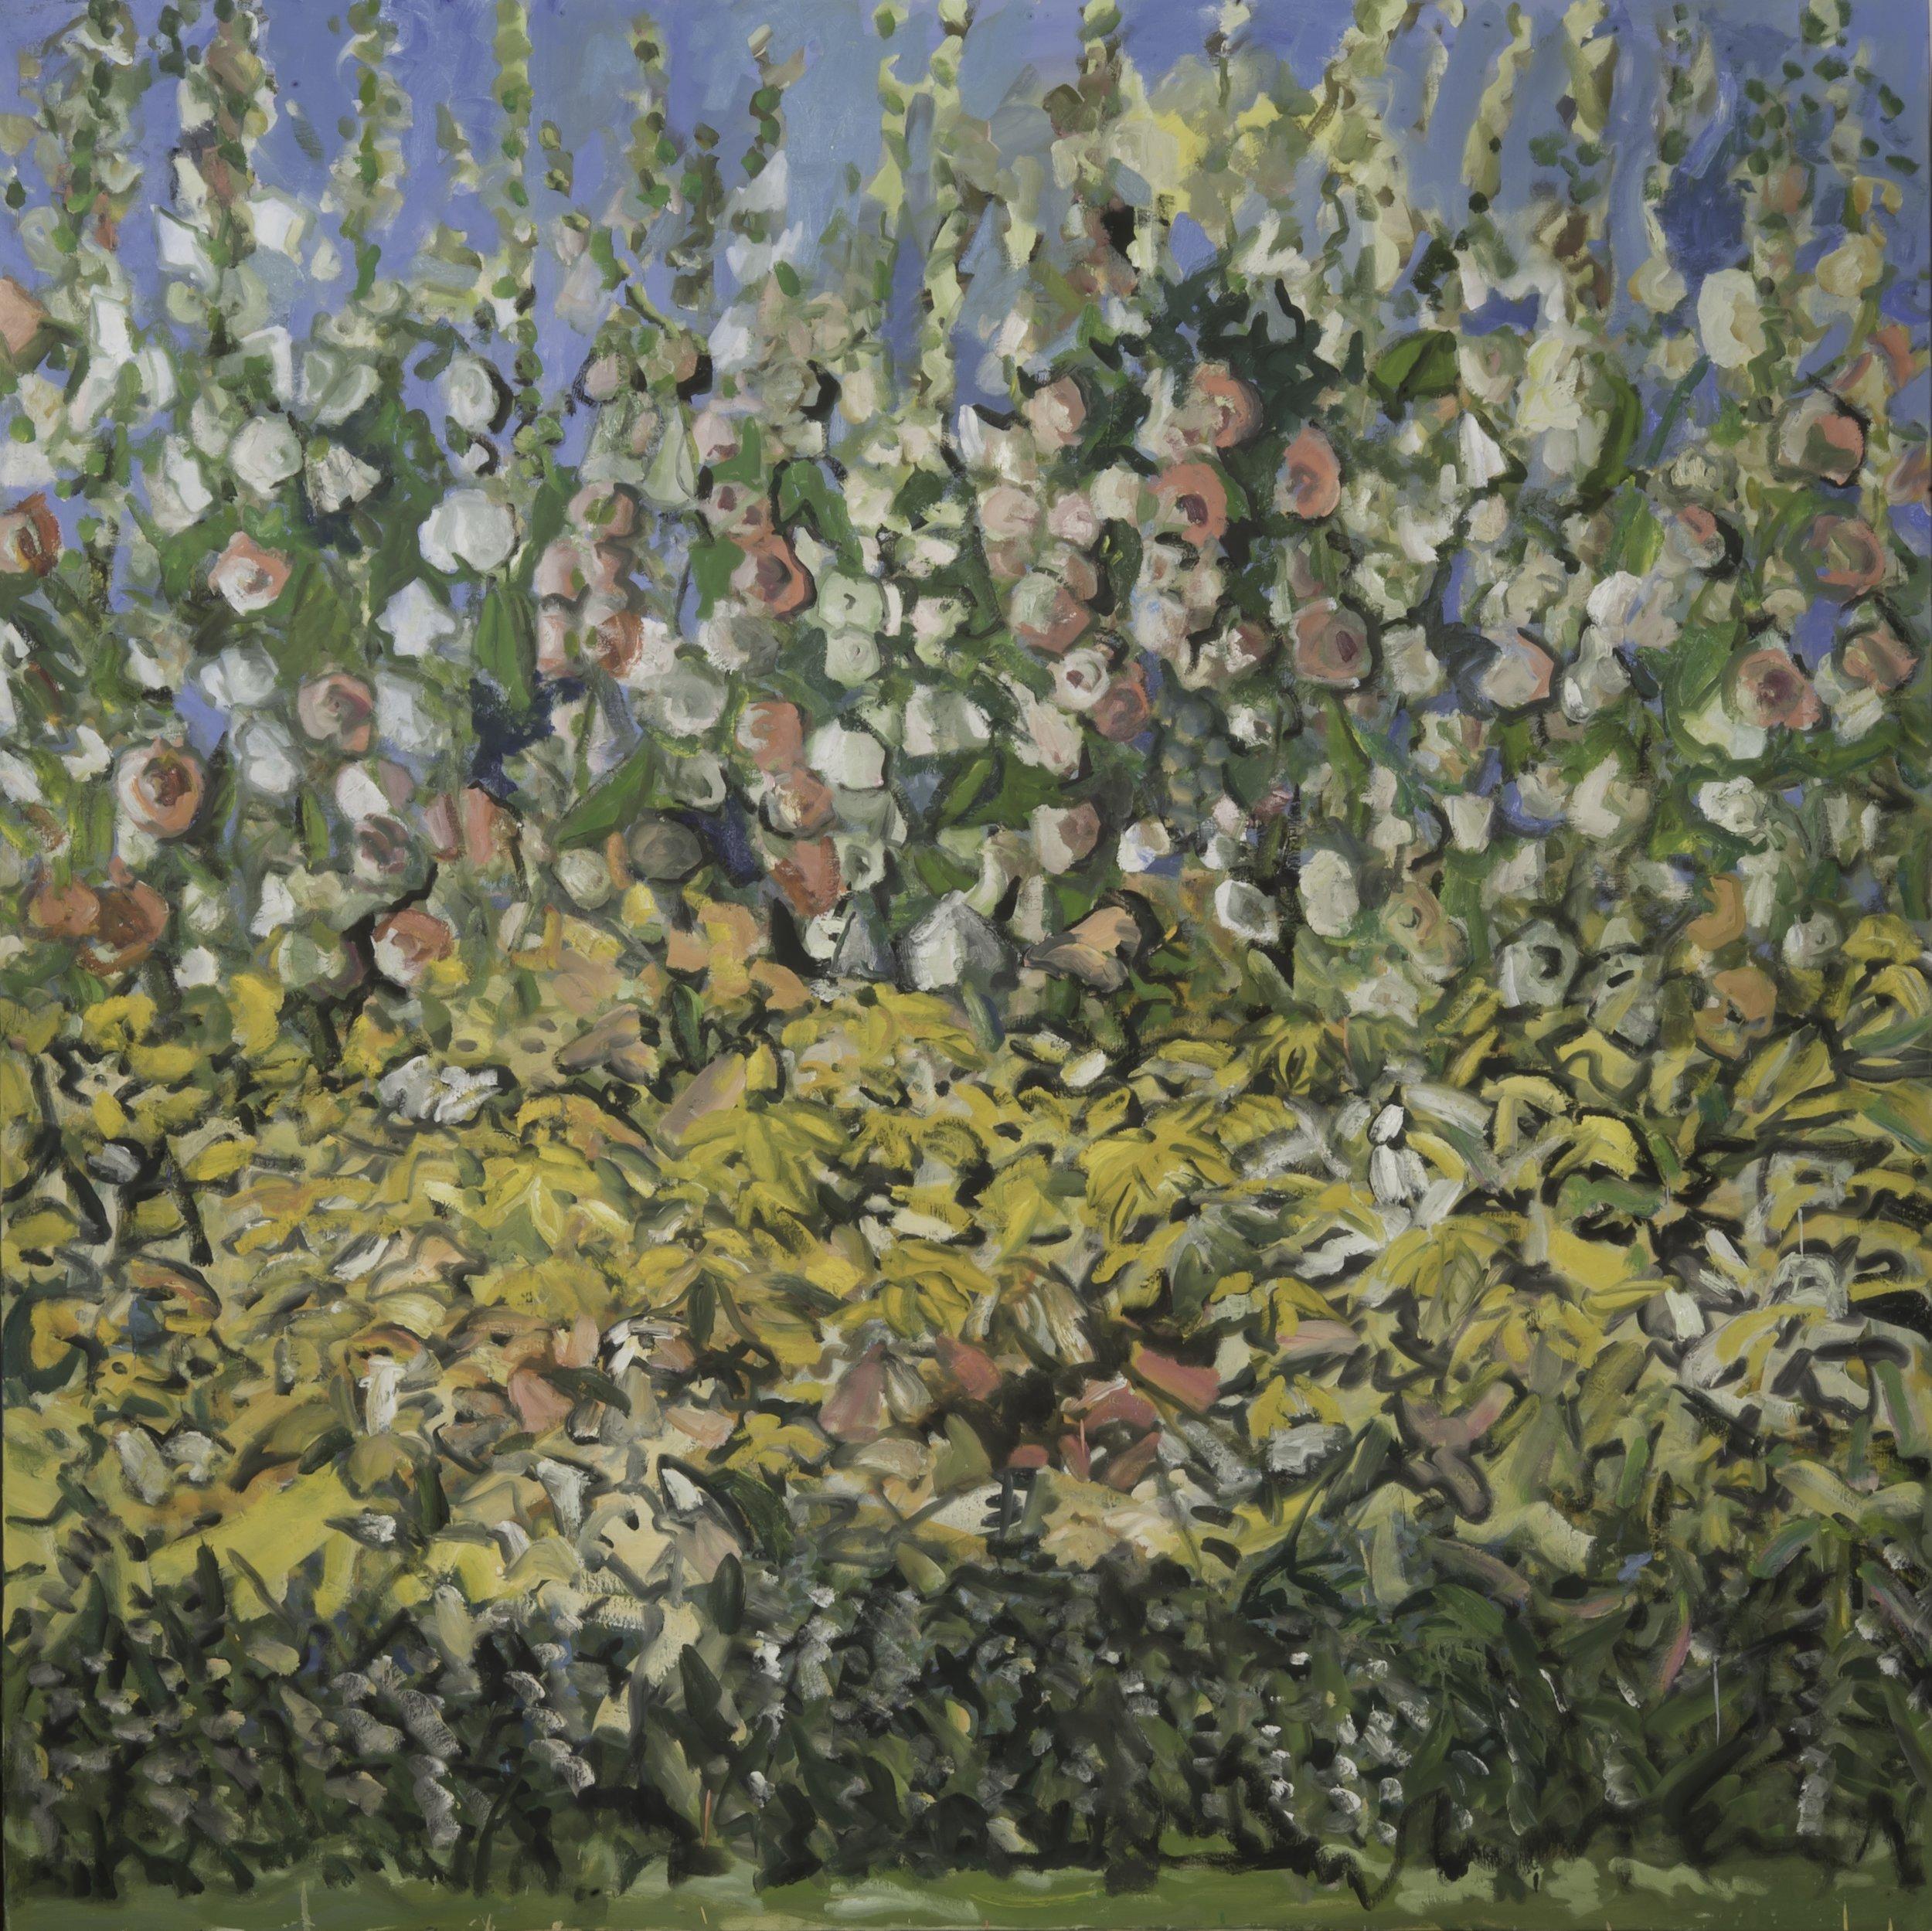 Garden Flowers #6